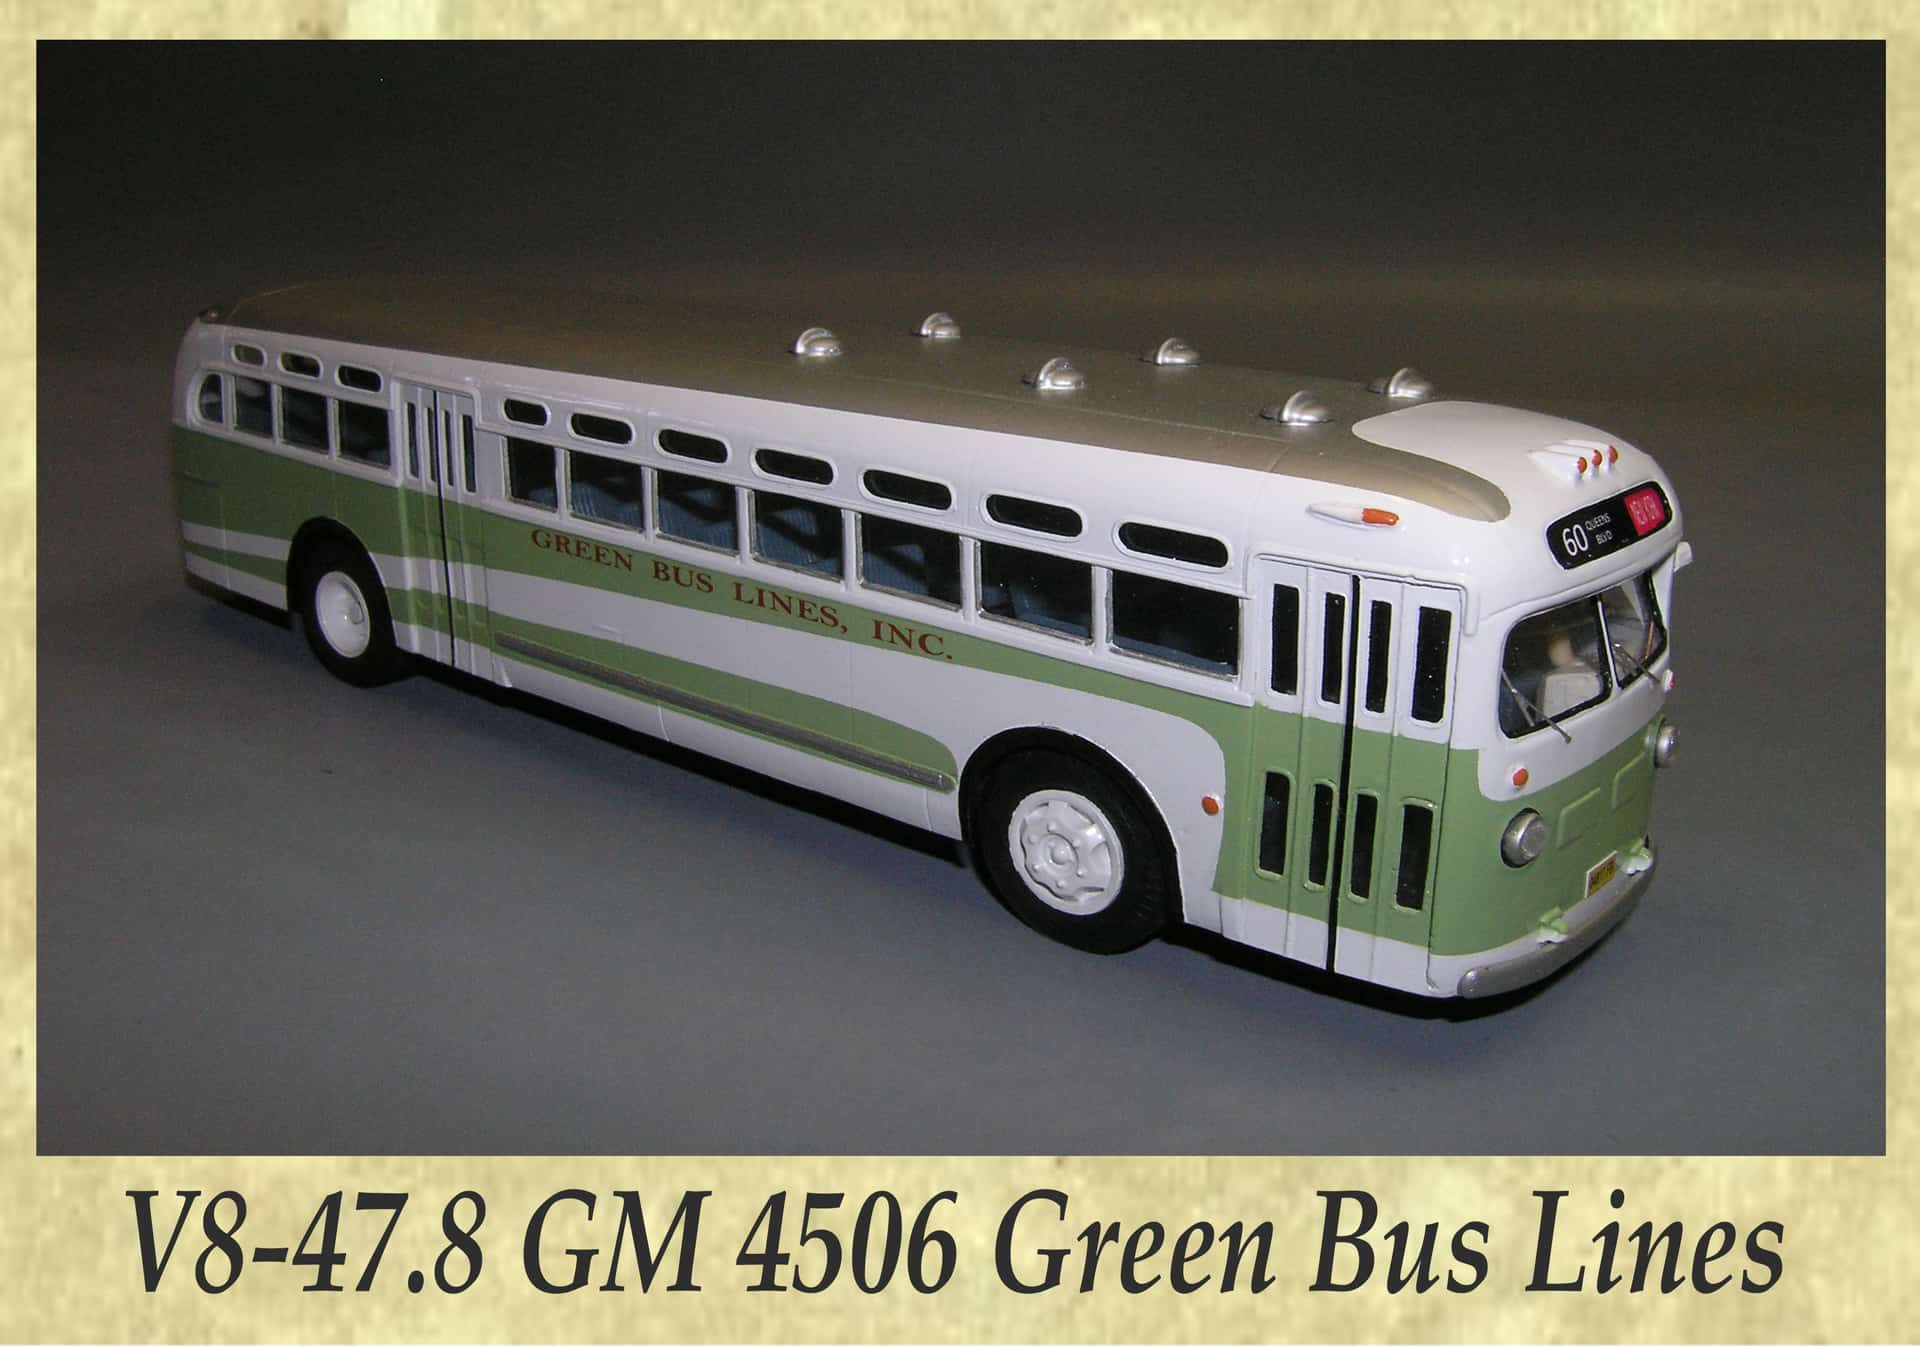 V8-47.8 GM 4506 Green Bus Lines